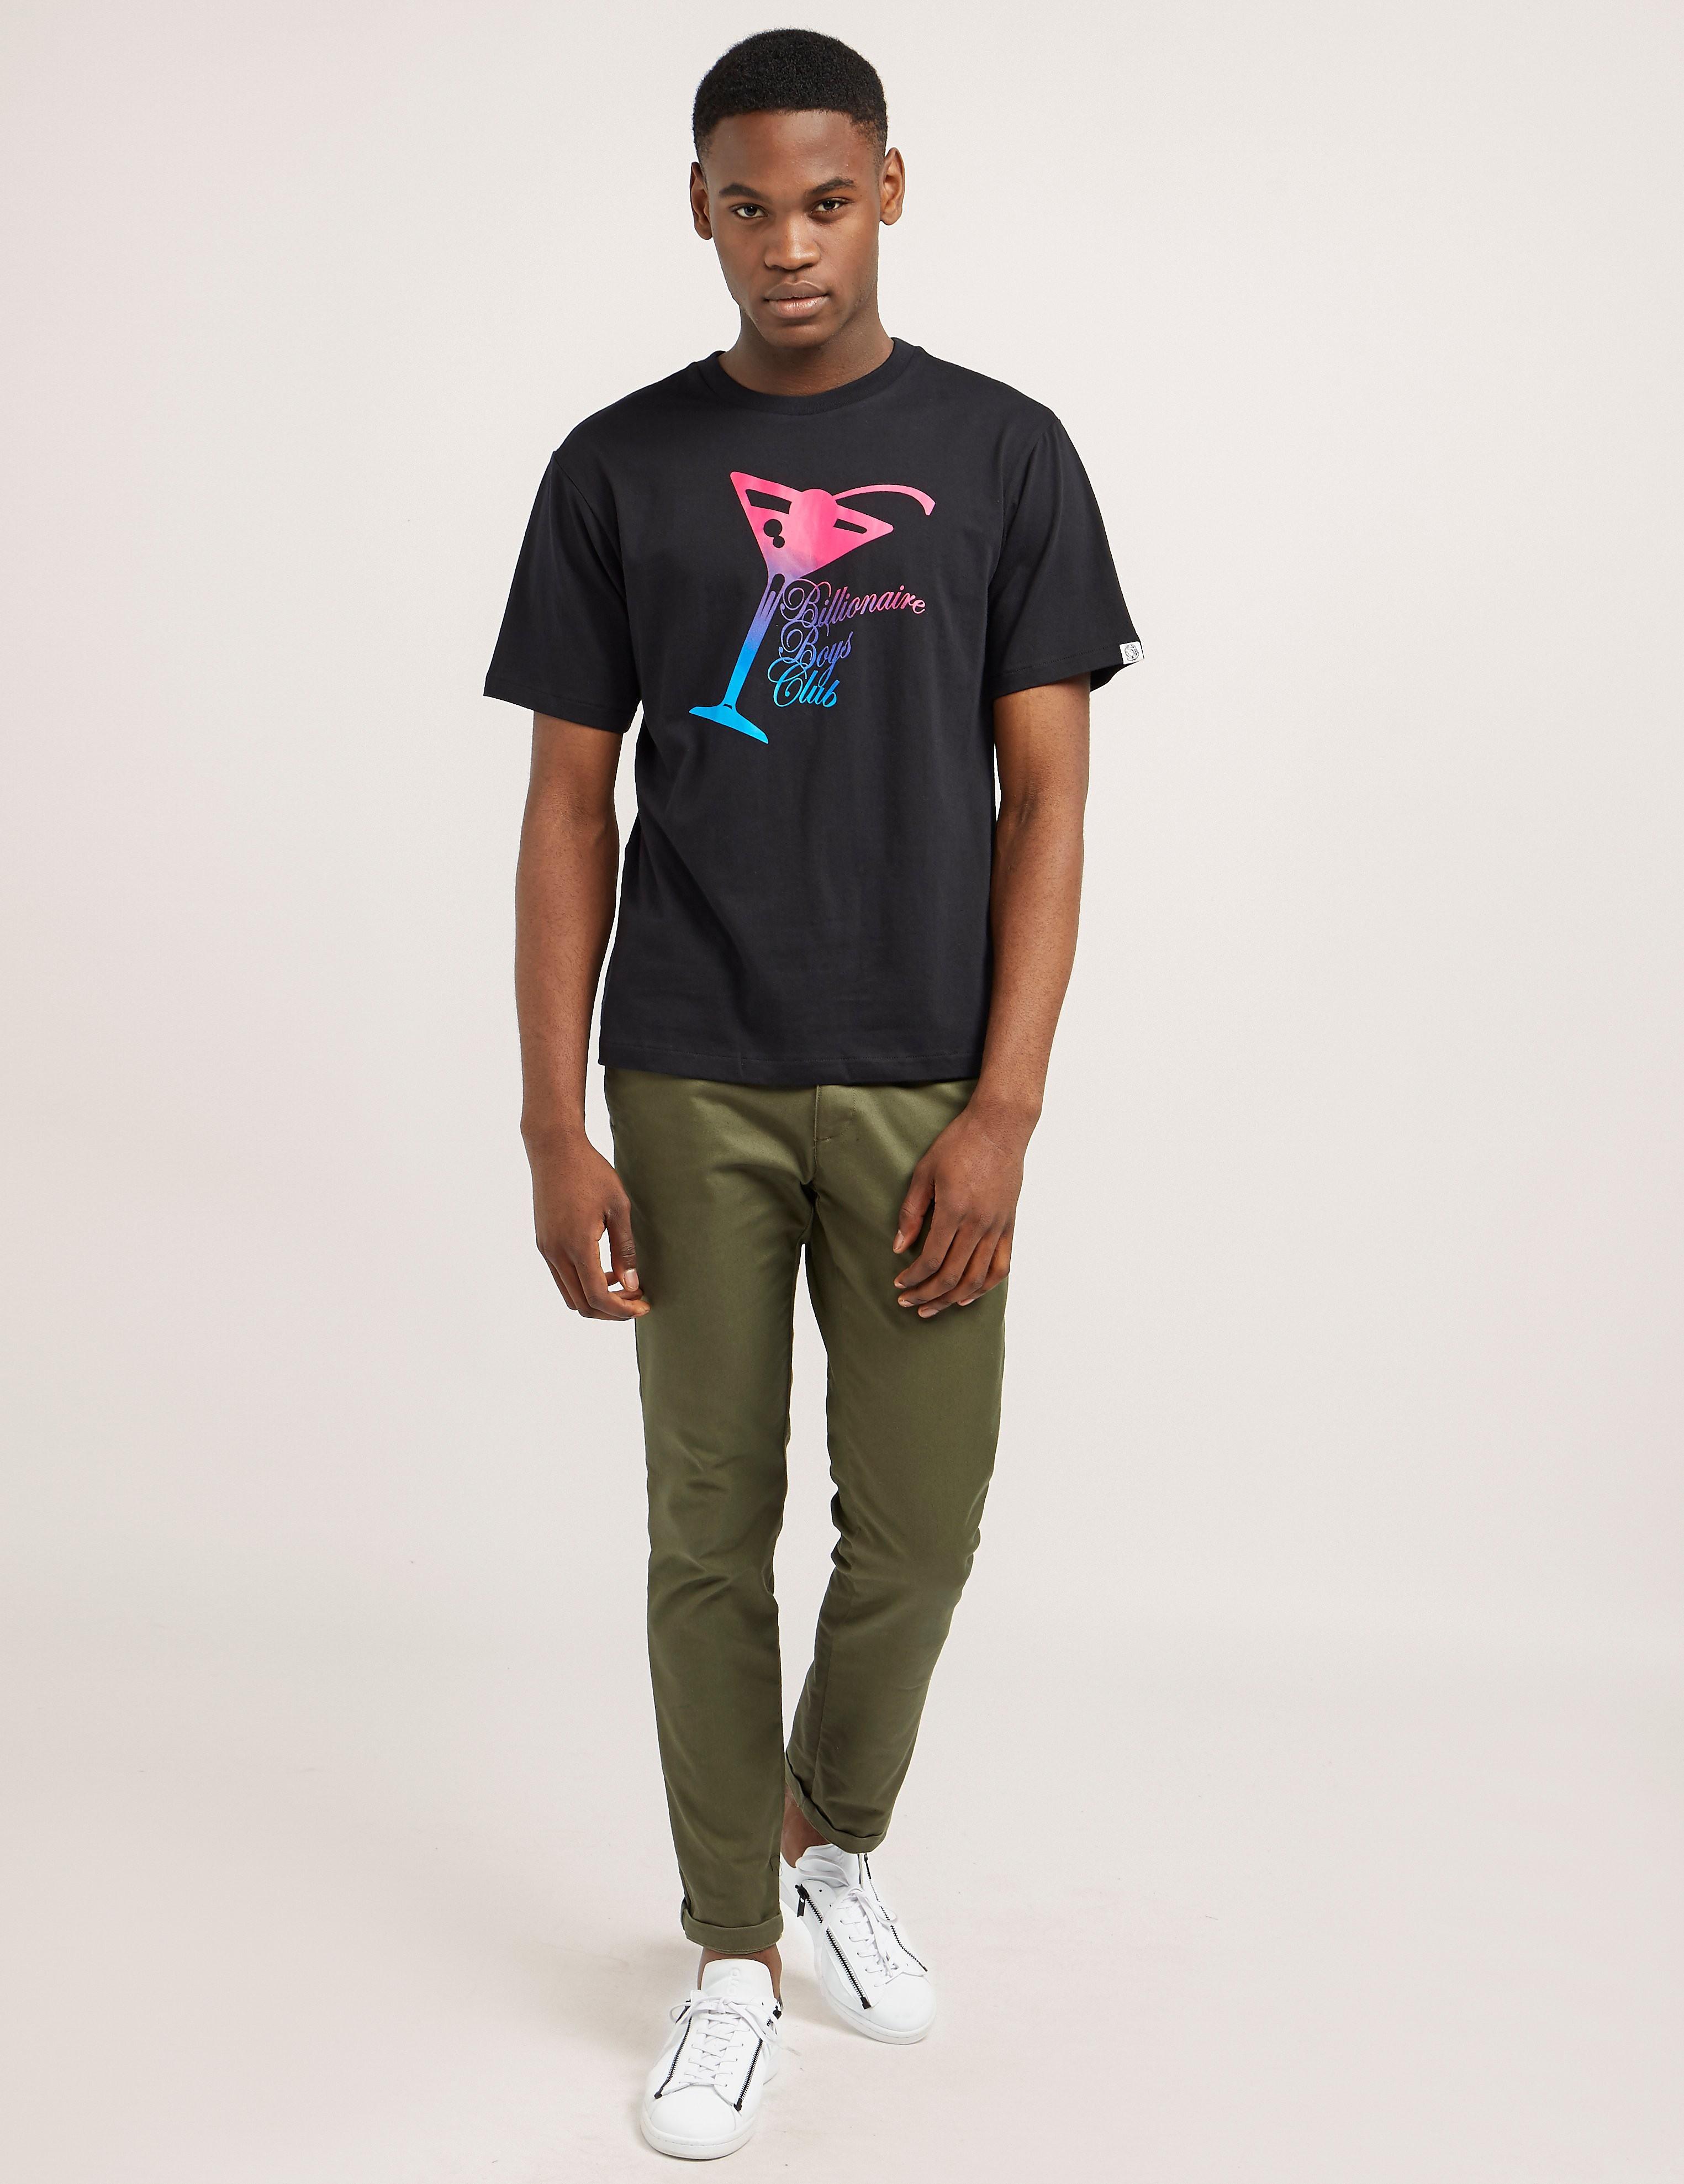 Billionaire Boys Club Martini Short Sleeve T-Shirt